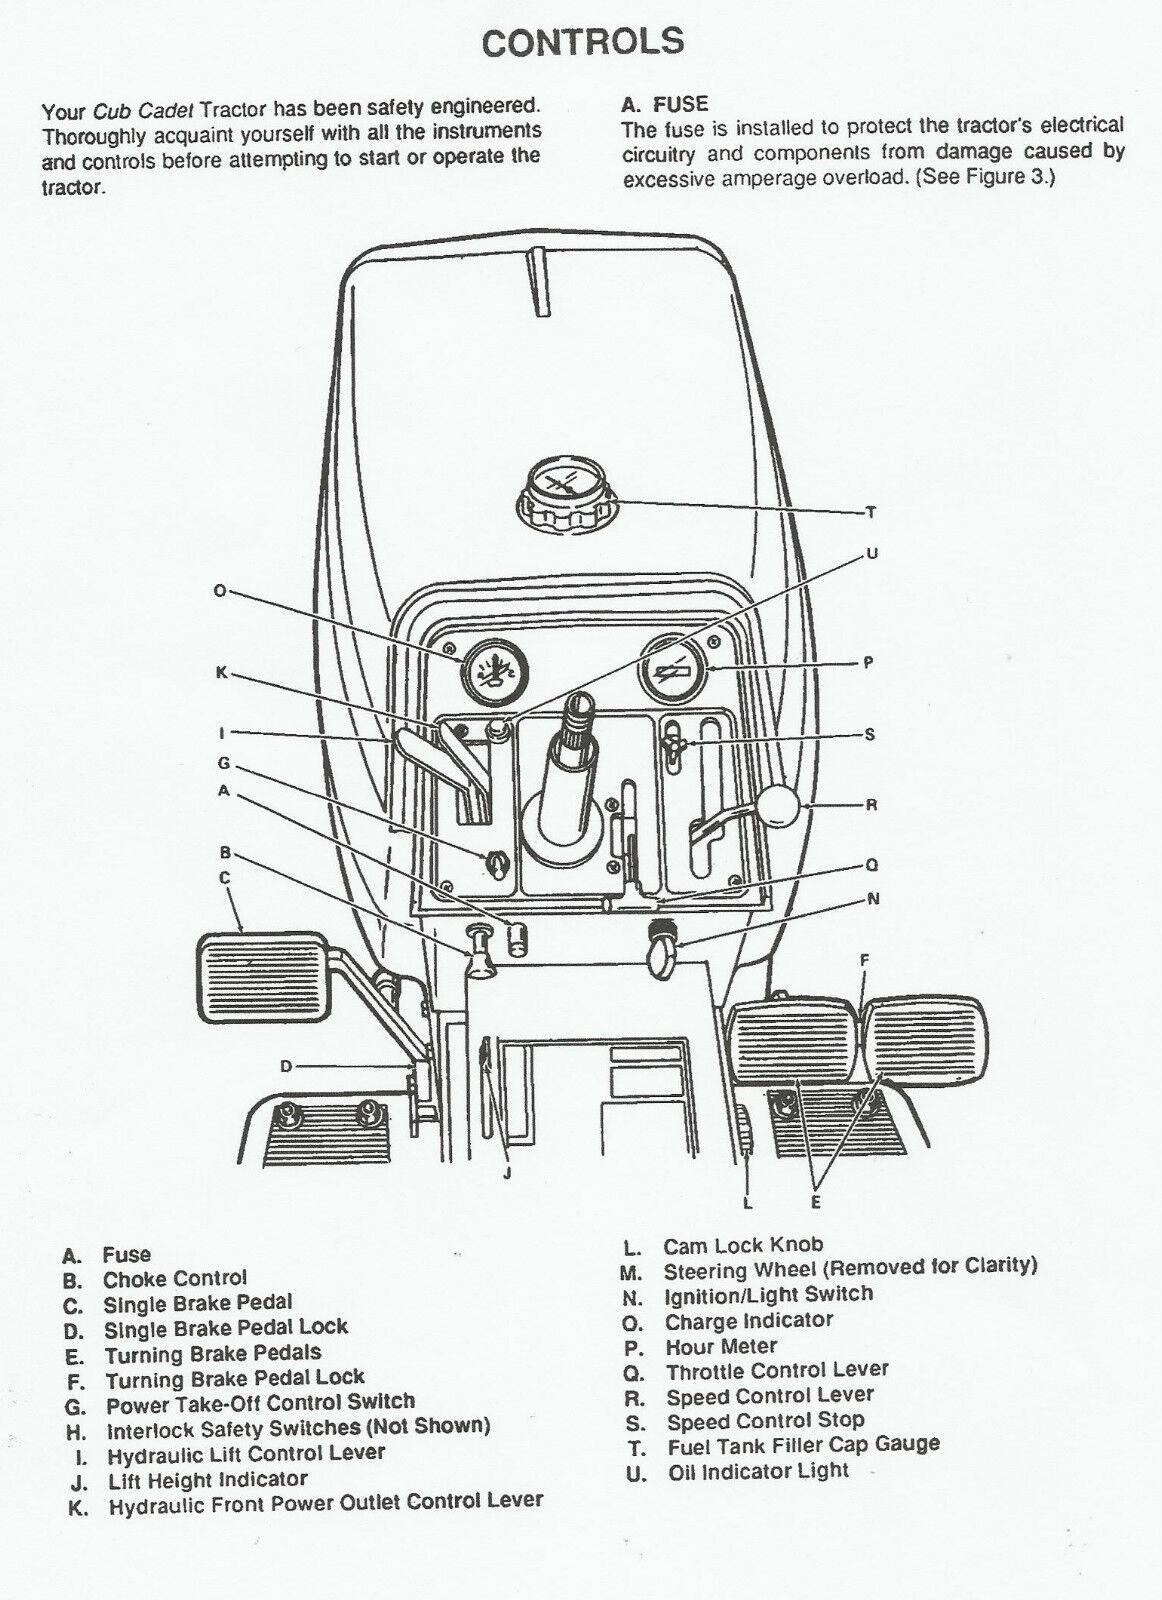 72 Cub Cadet Wiring Diagram